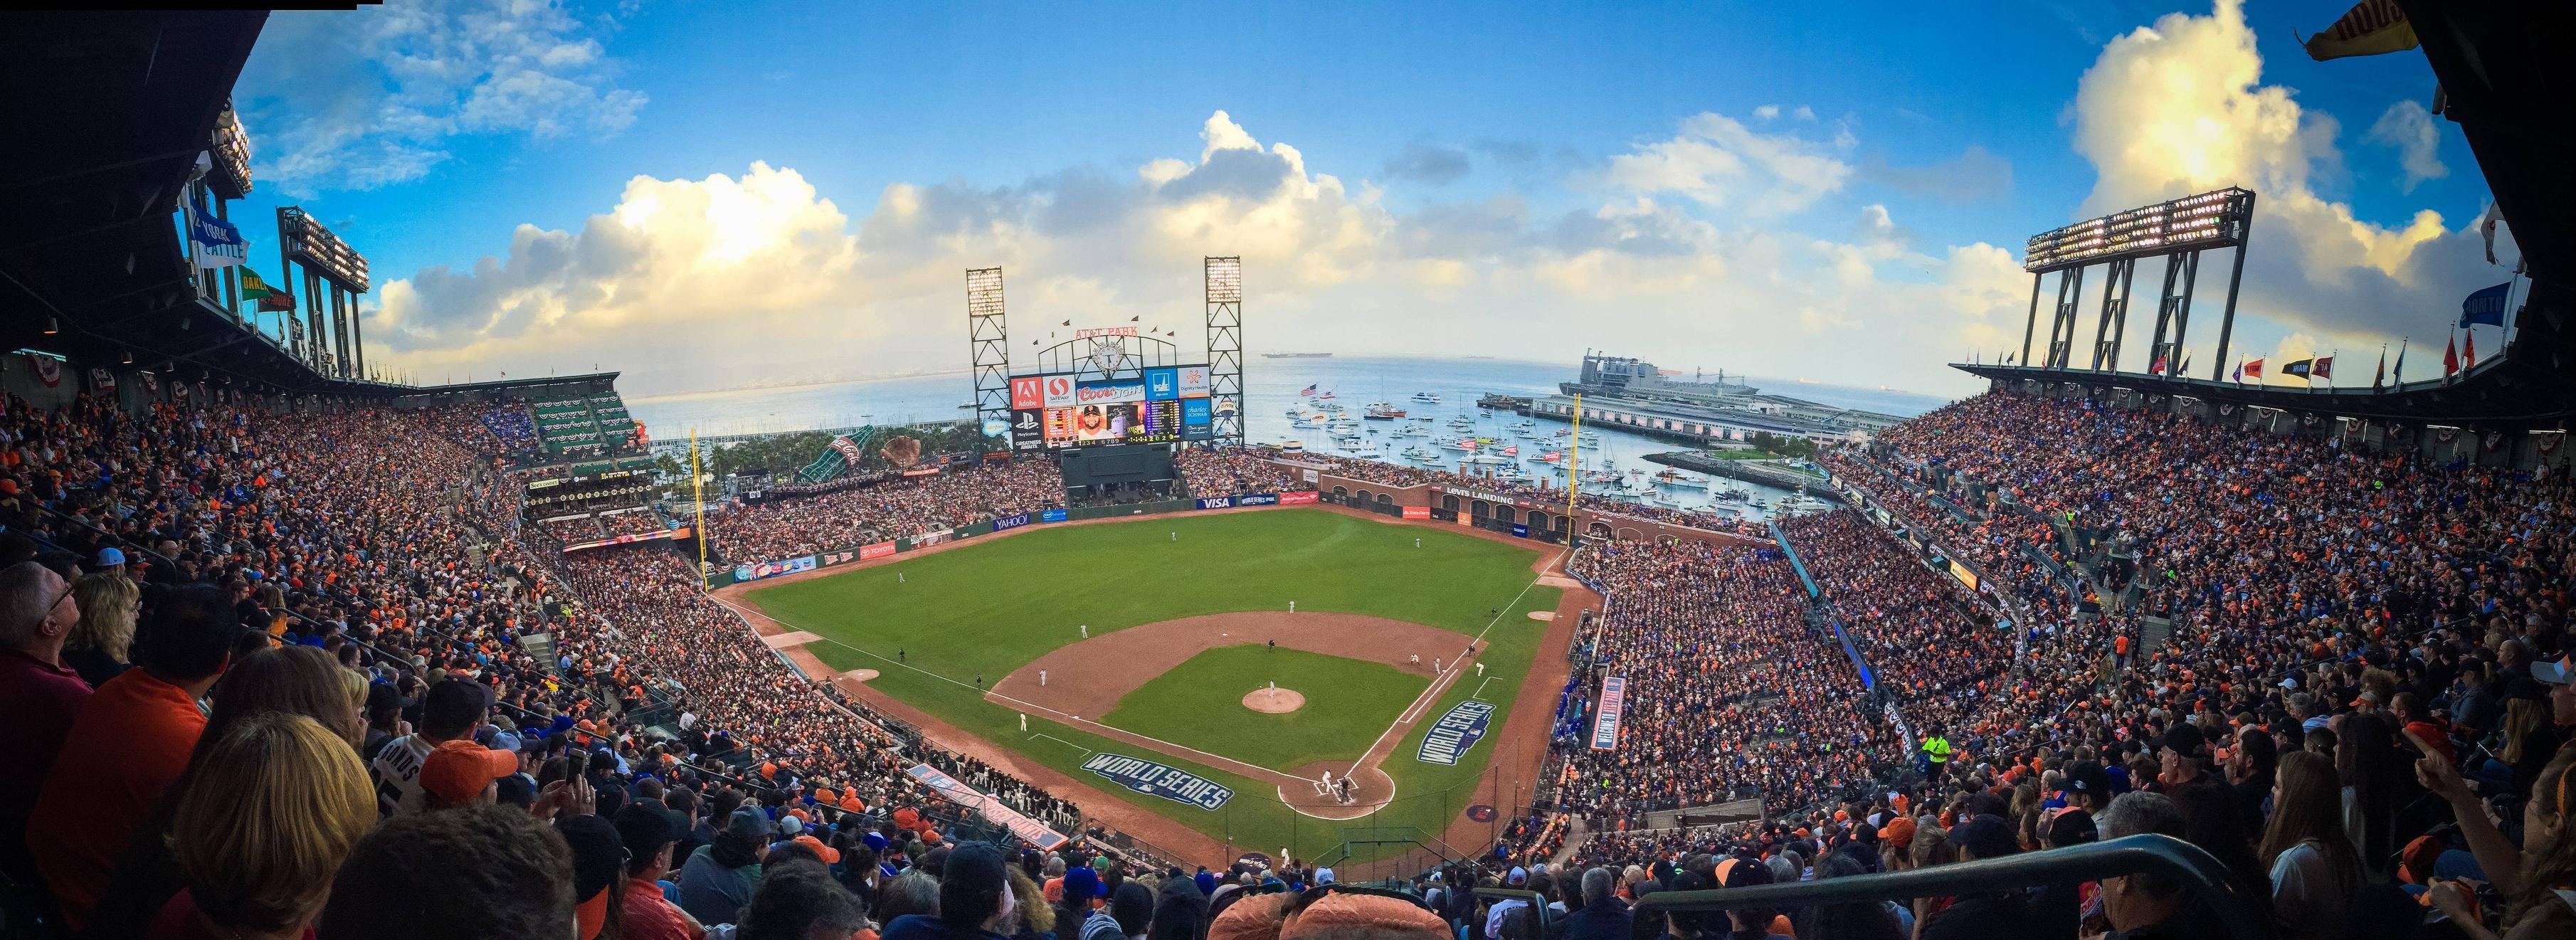 San Francisco Giants Stadium Wallpaper: Sf Giants 2018 Schedule Wallpaper (61+ Images